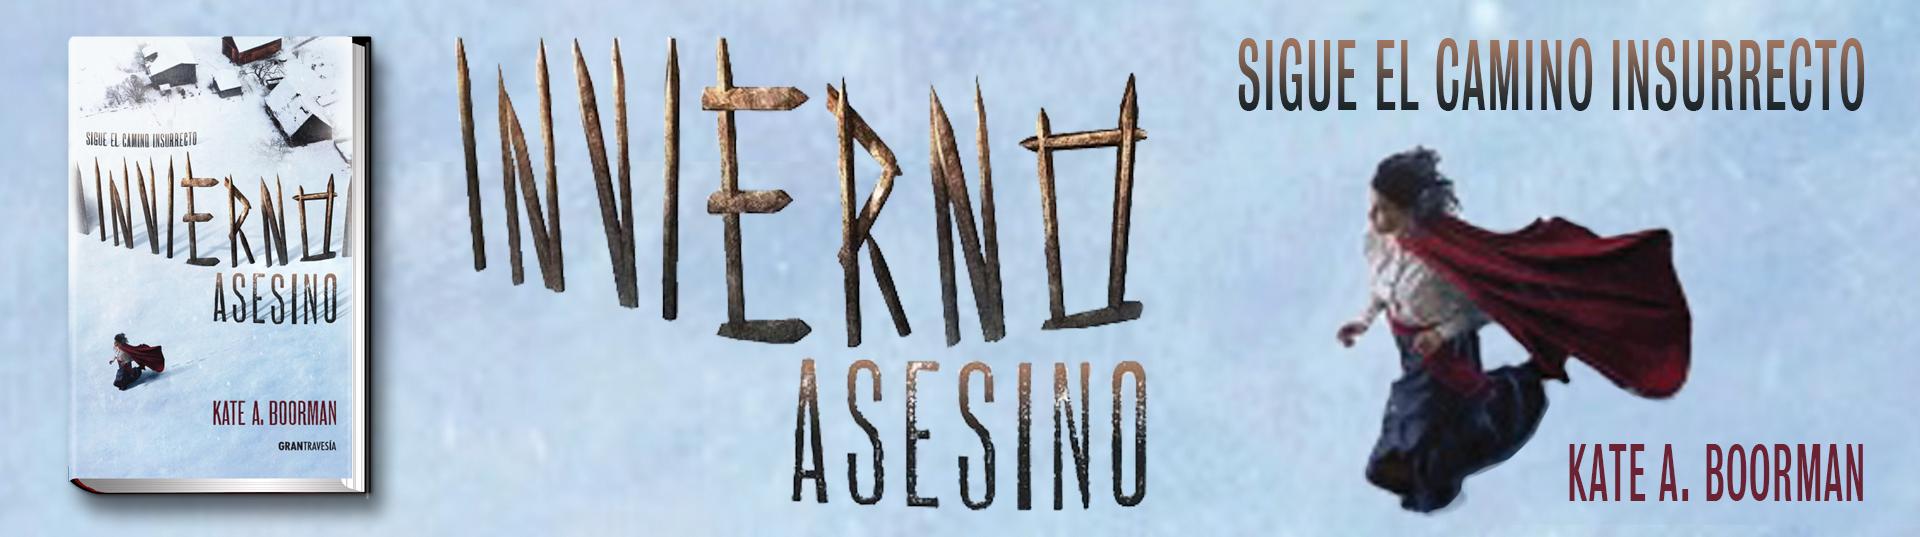 Slide_Invierno_Asesino